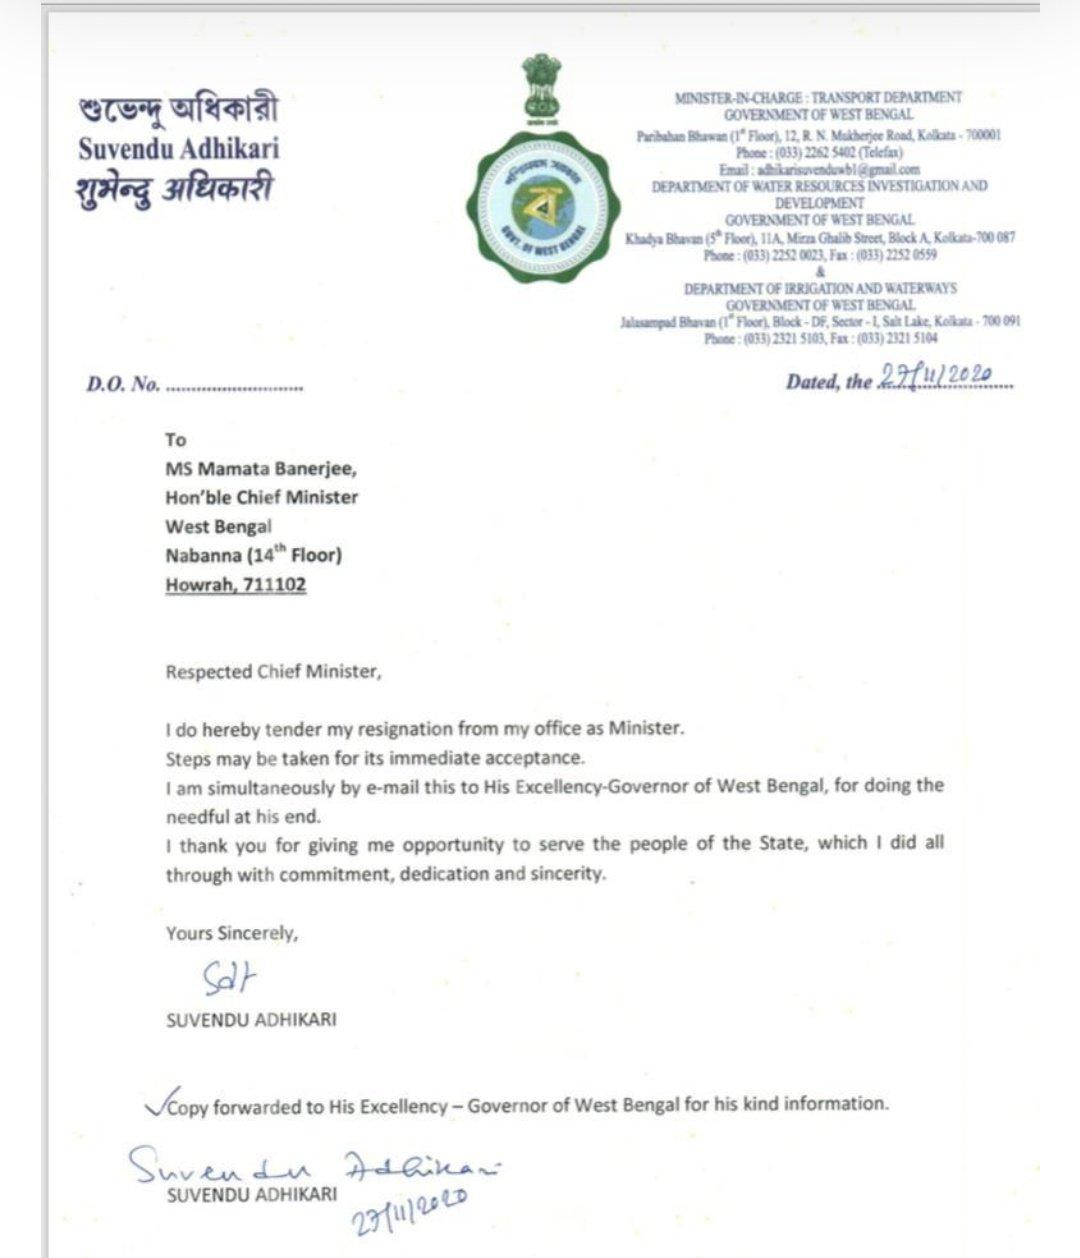 Suvendu Adhikari Resignation